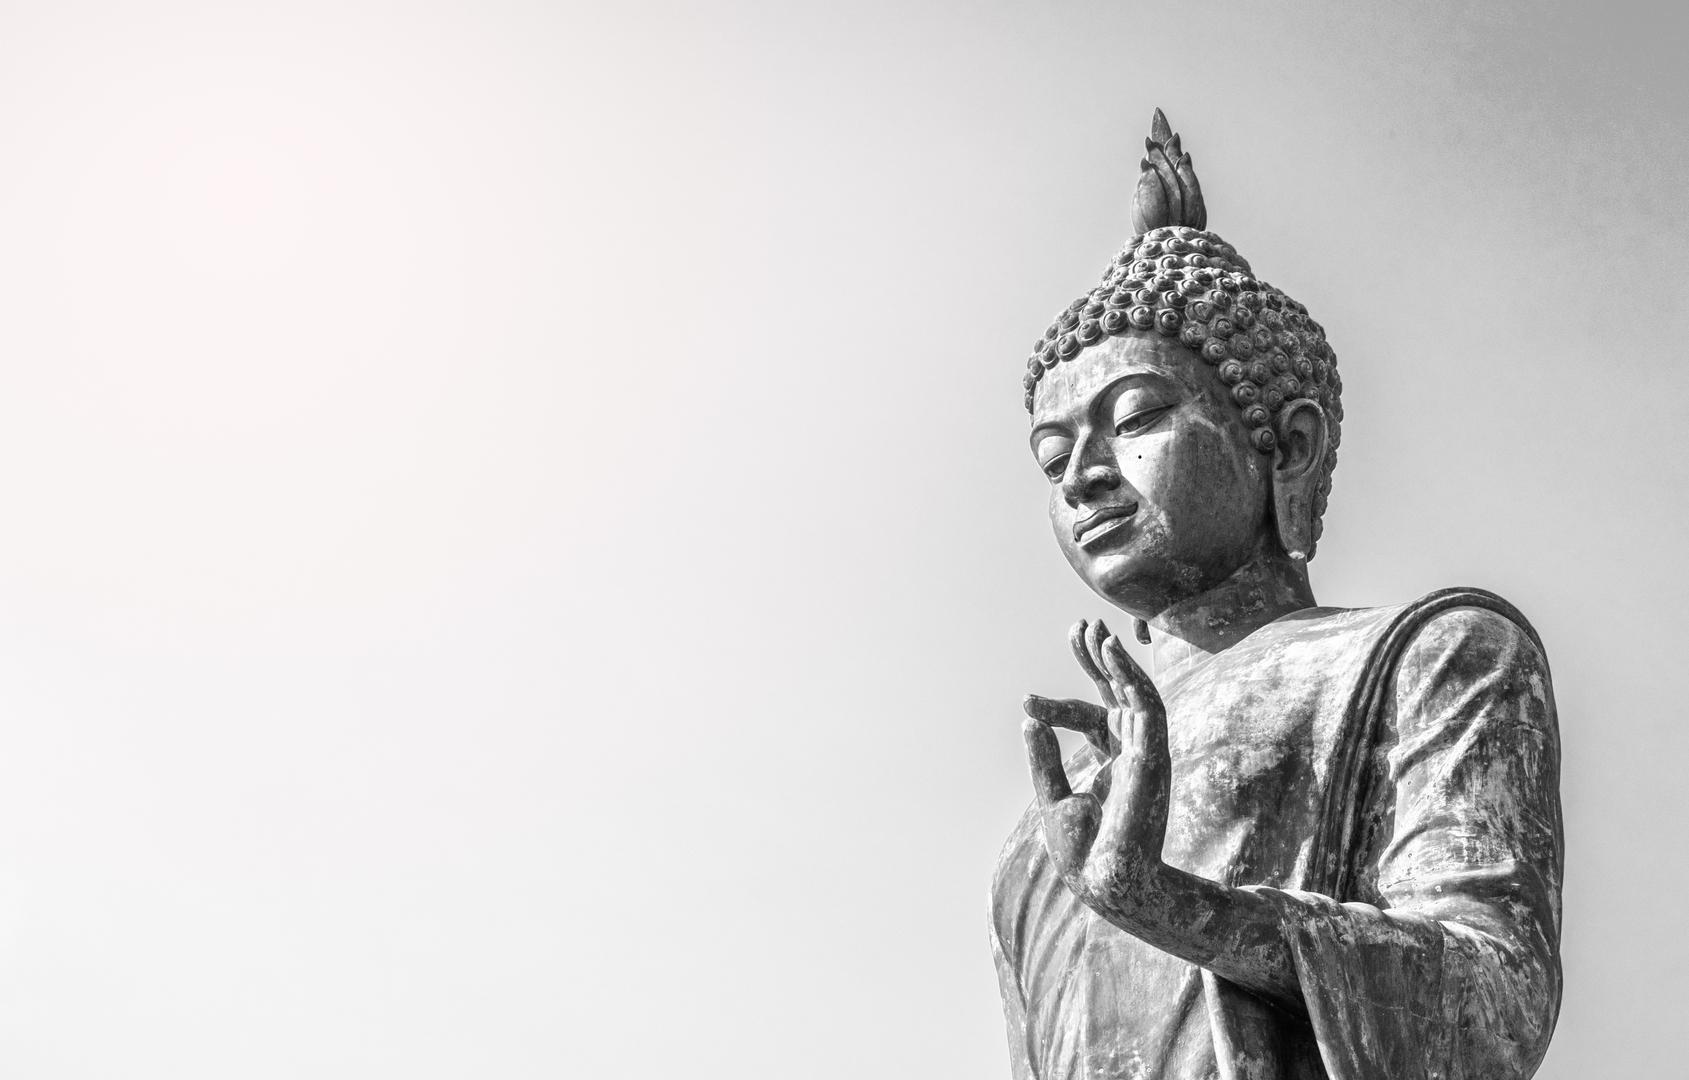 בודהיזם בג'ינס | אלון פאר - קורס